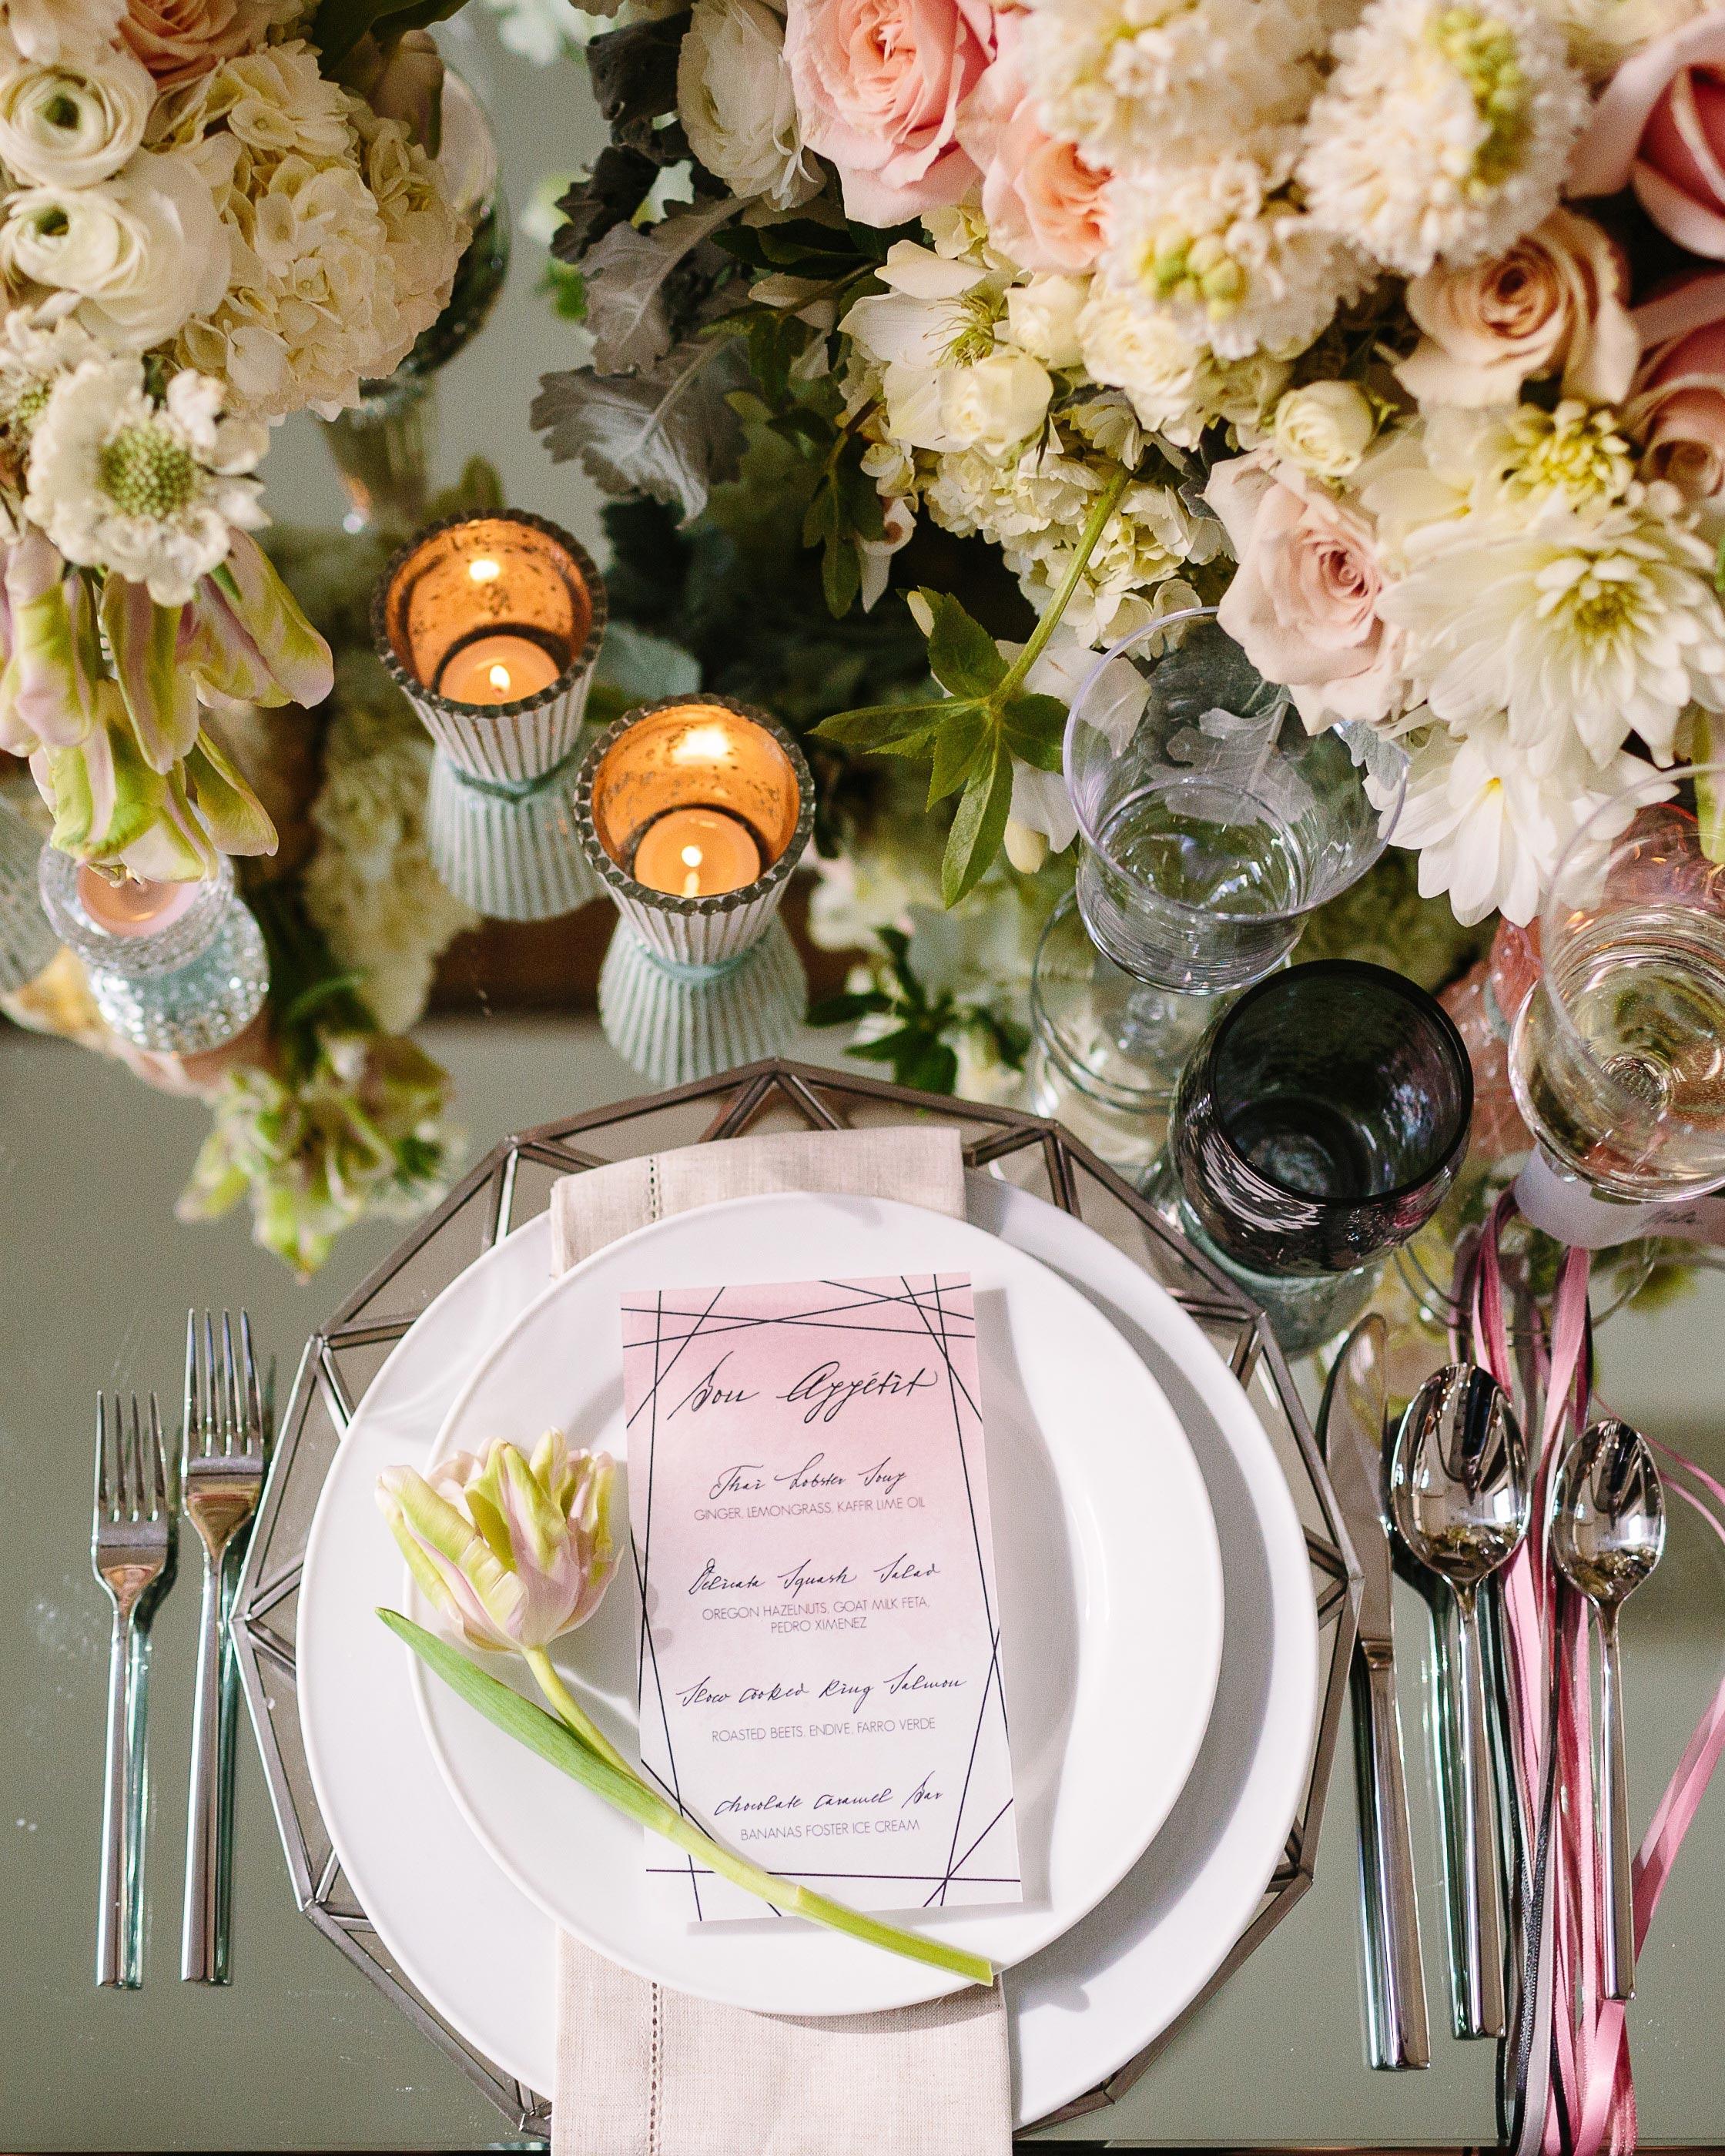 valentines-day-wedding-ideas-tables-0216.jpg